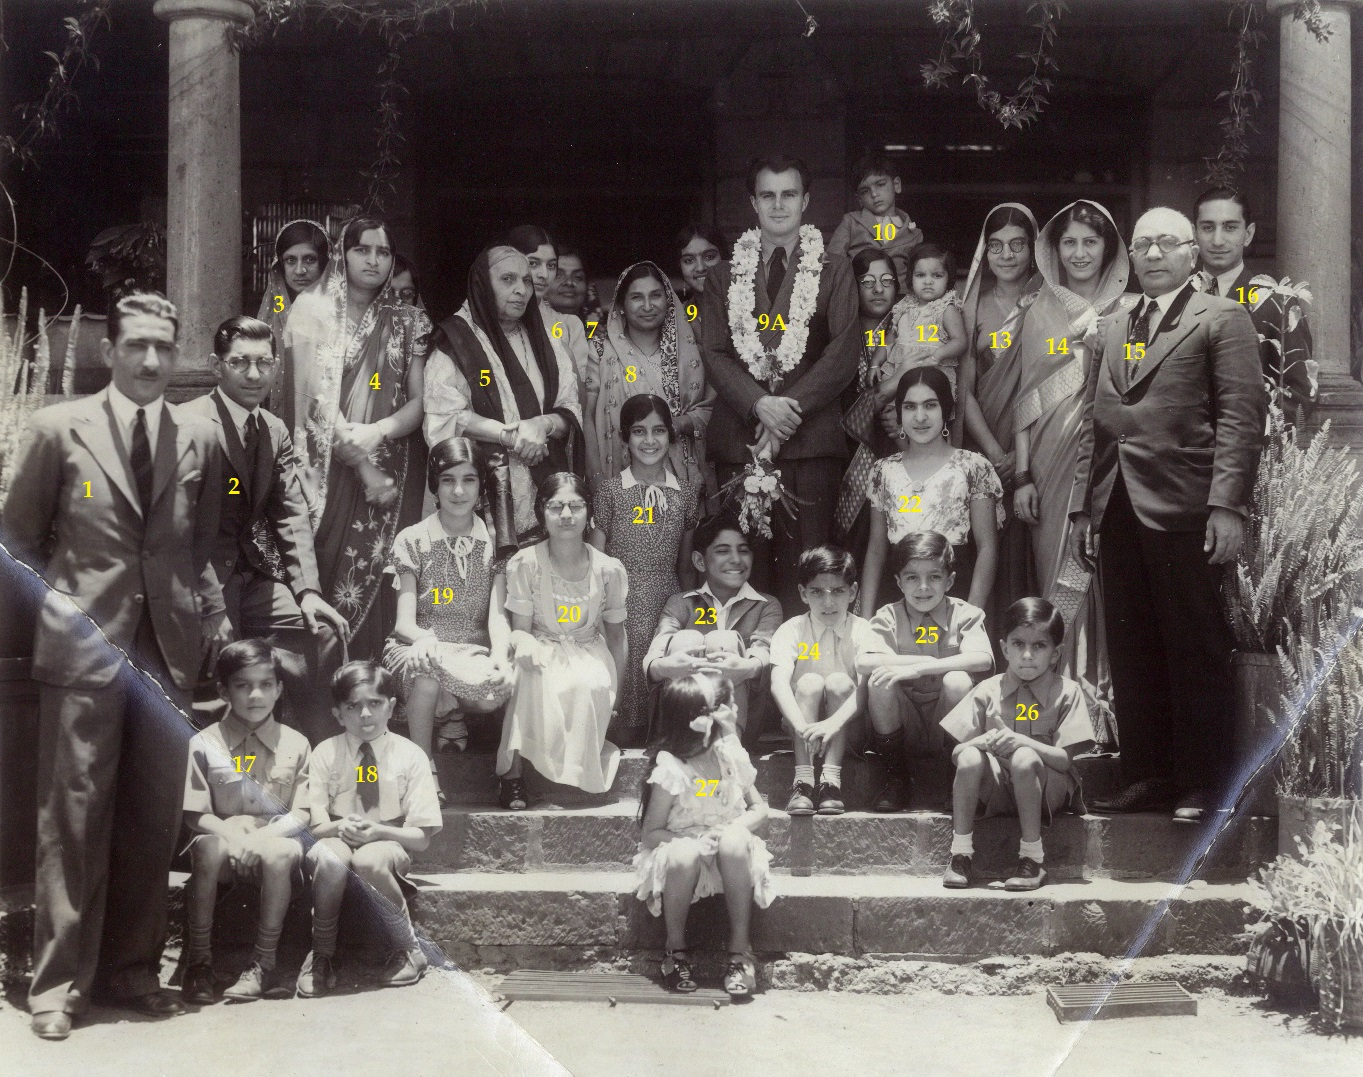 Jan Karmali photo collection of Aga Khan Barakah Prince Aly Khan